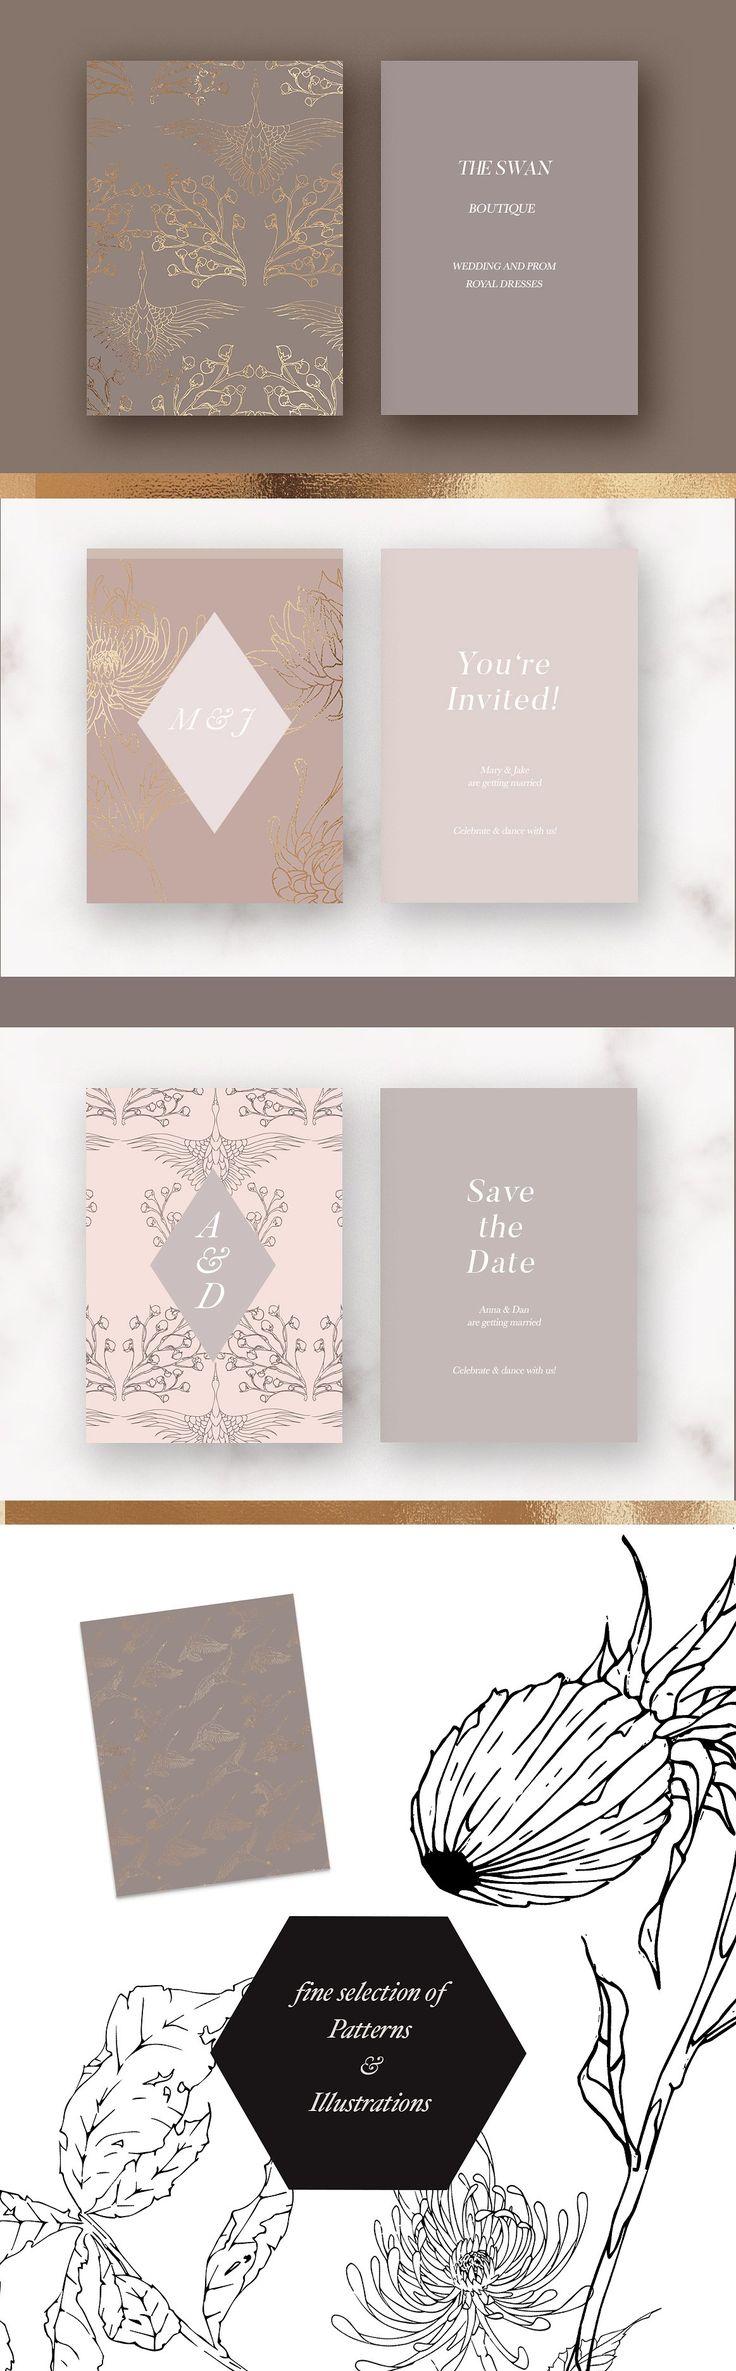 95 Best Wedding Stationery Images On Pinterest Stationery Design